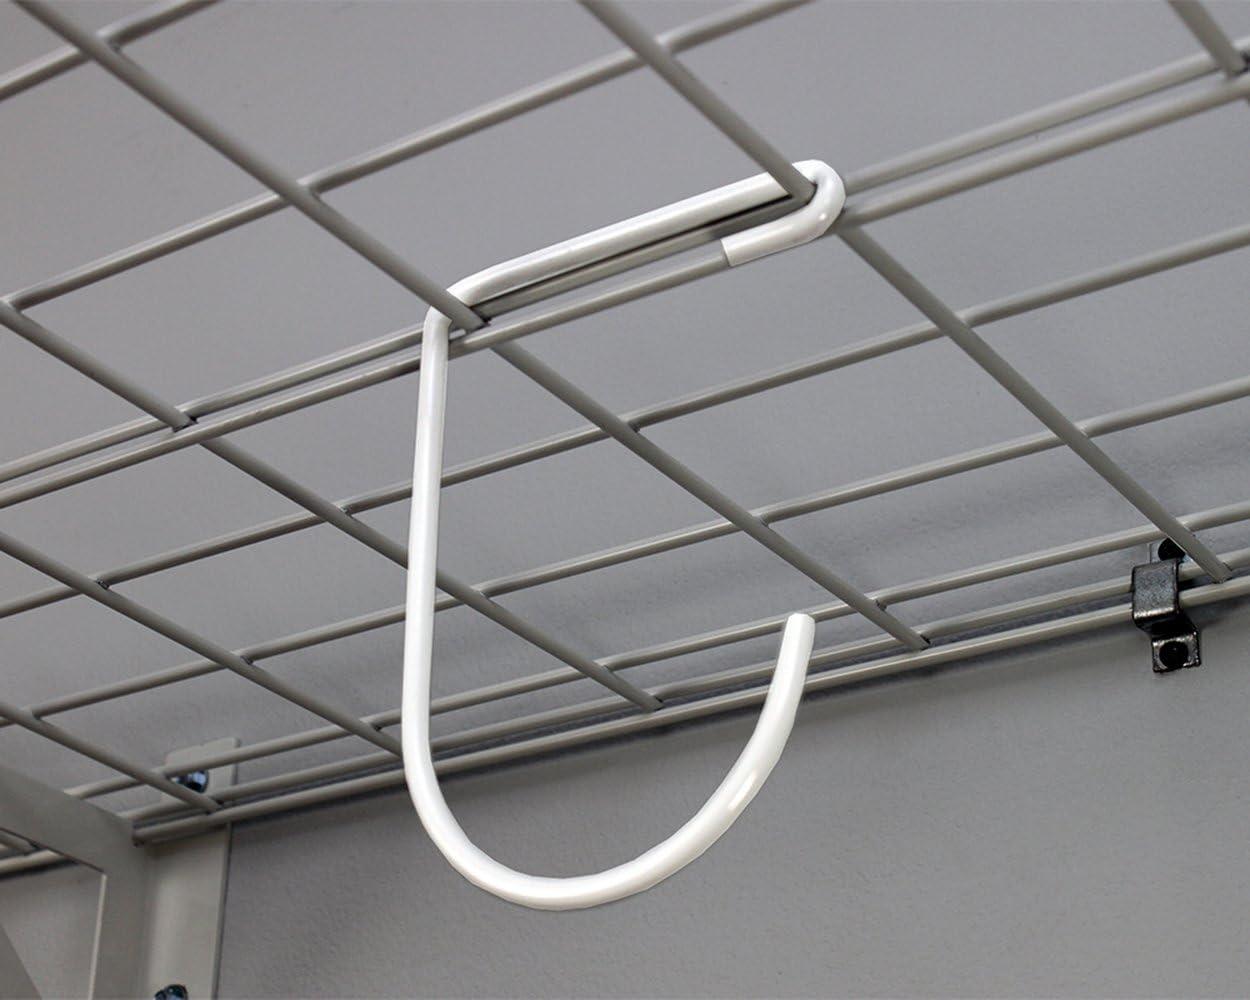 SafeRacks Garage Wall Shelf Two-Pack 18x36 18x36, White Includes Bike Hooks 500lb Capacity